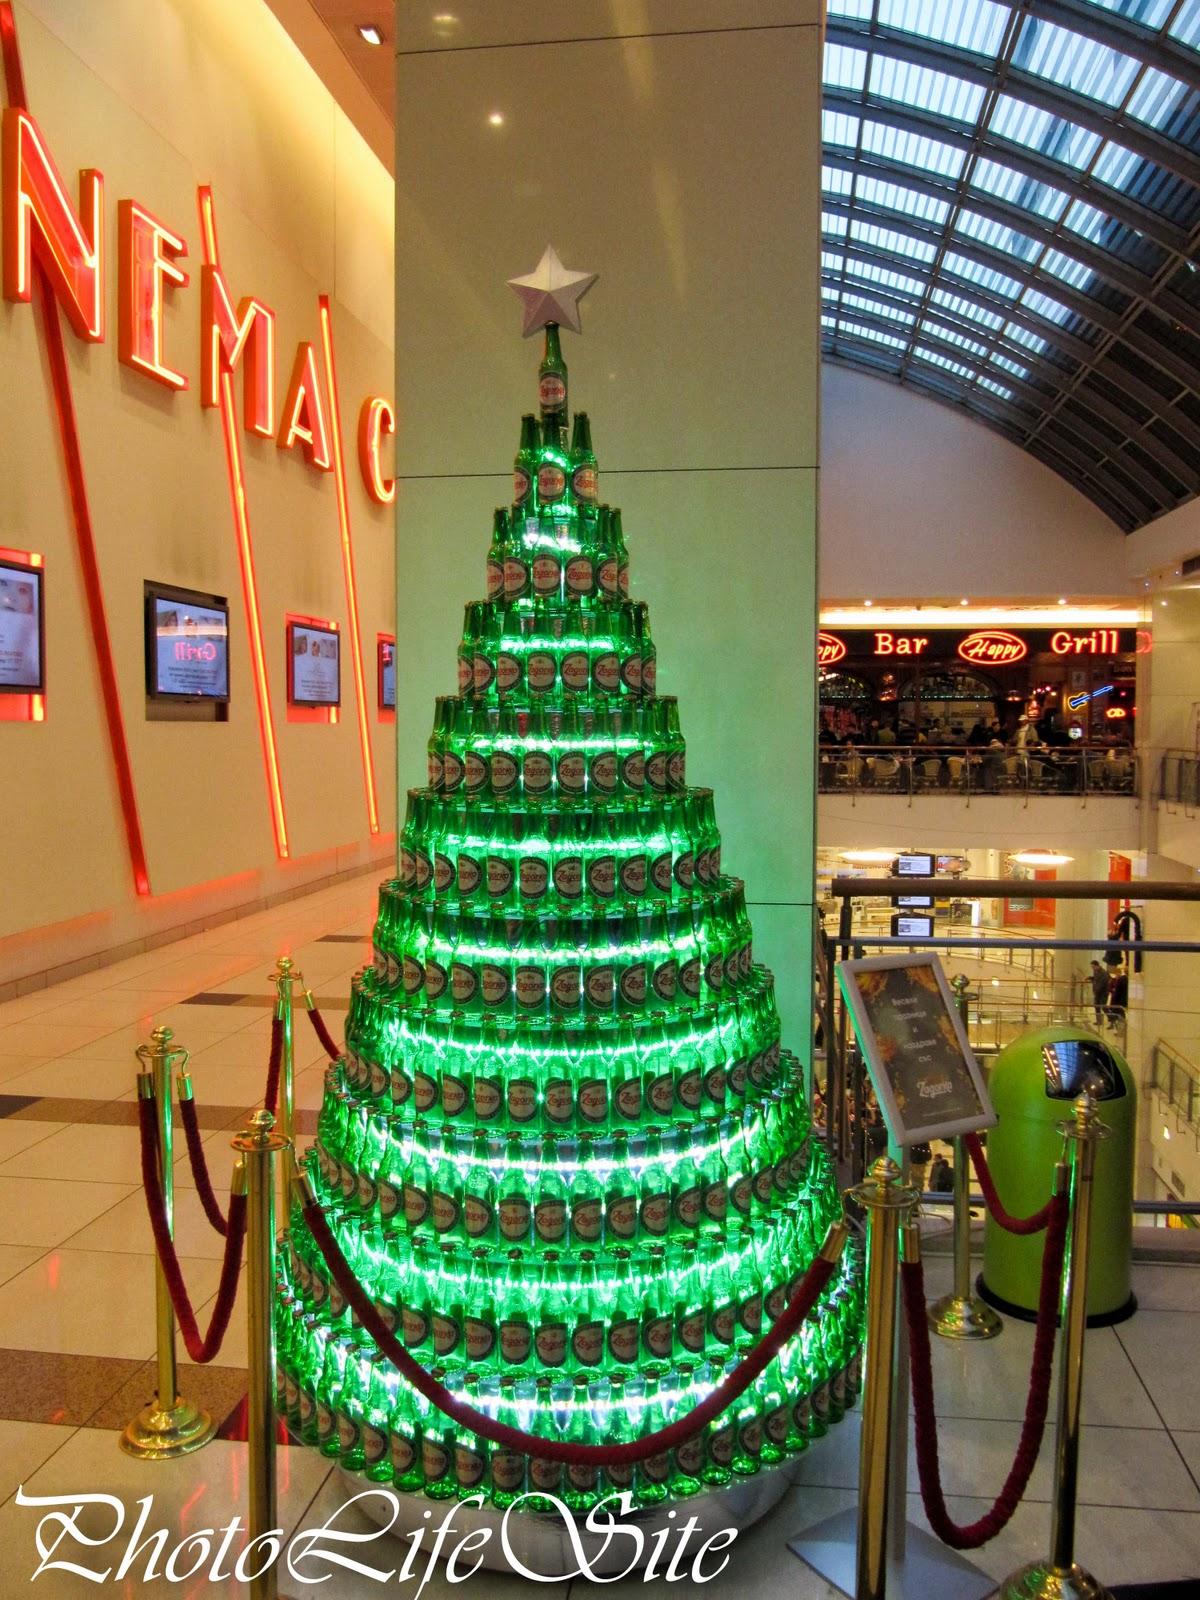 Photolifesite ww beer bottle christmas tree linky for How to make a beer bottle christmas tree